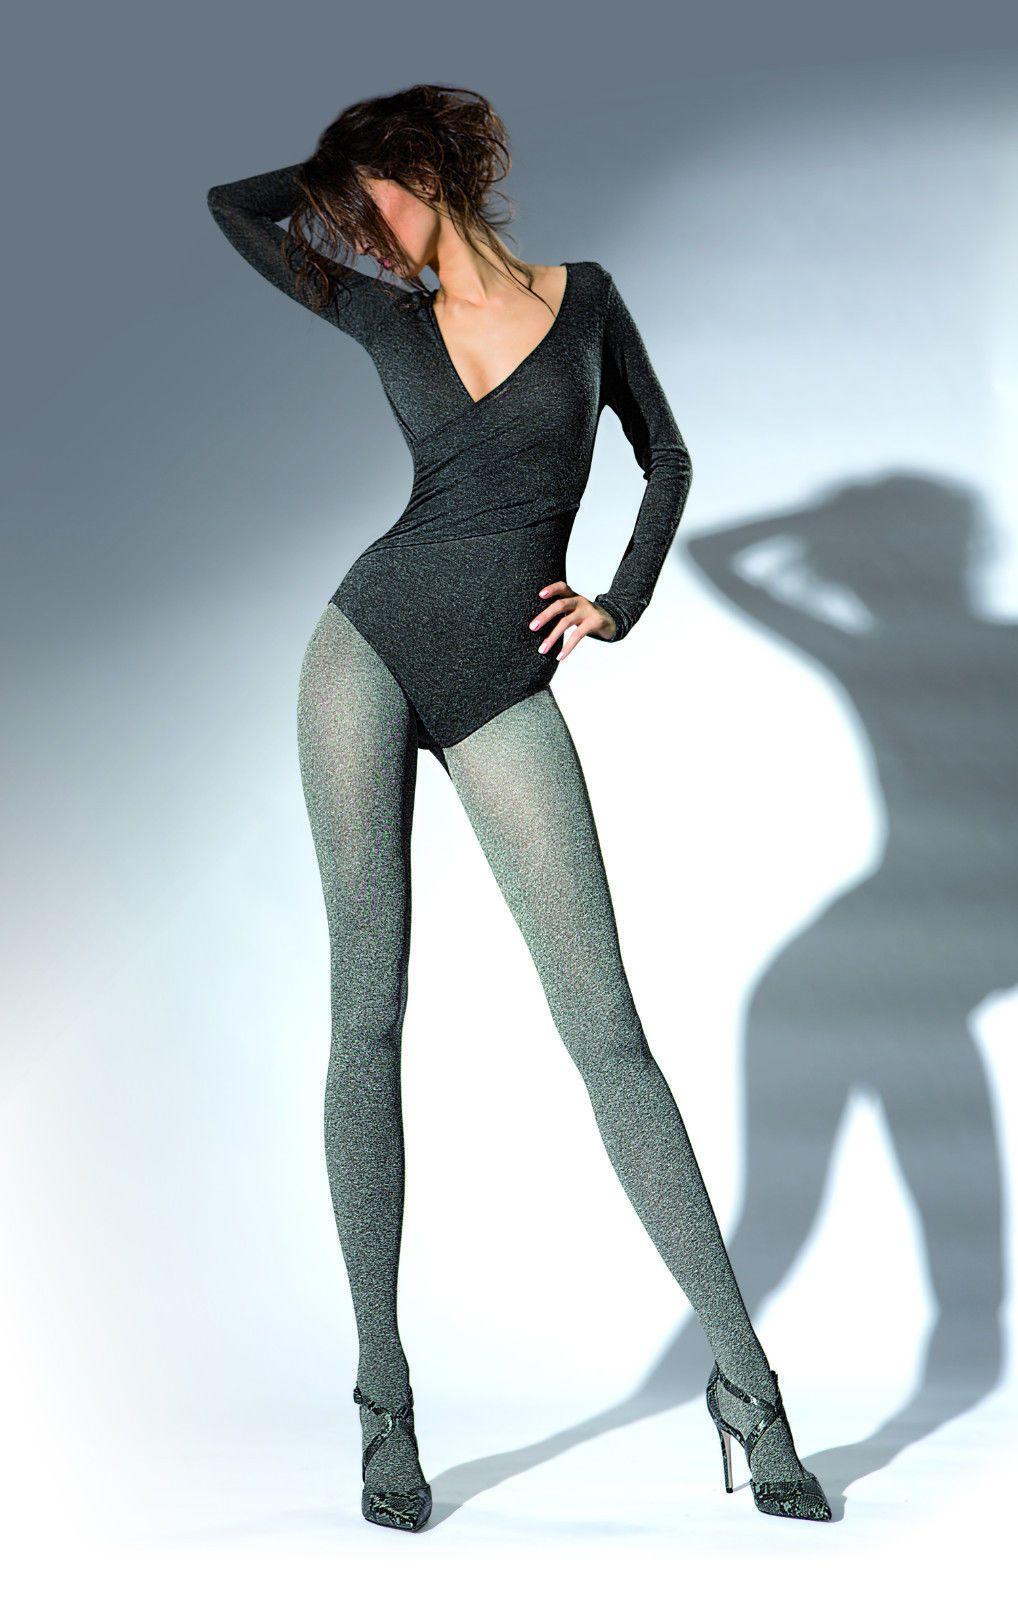 eba6eae823acd 11.60 | Silver Grey melange winter soft daily warm thick 200 den xl Tights  Pantyhose T77 ❤ #silver #grey #melange #winter #soft #daily #warm #thick # tights ...